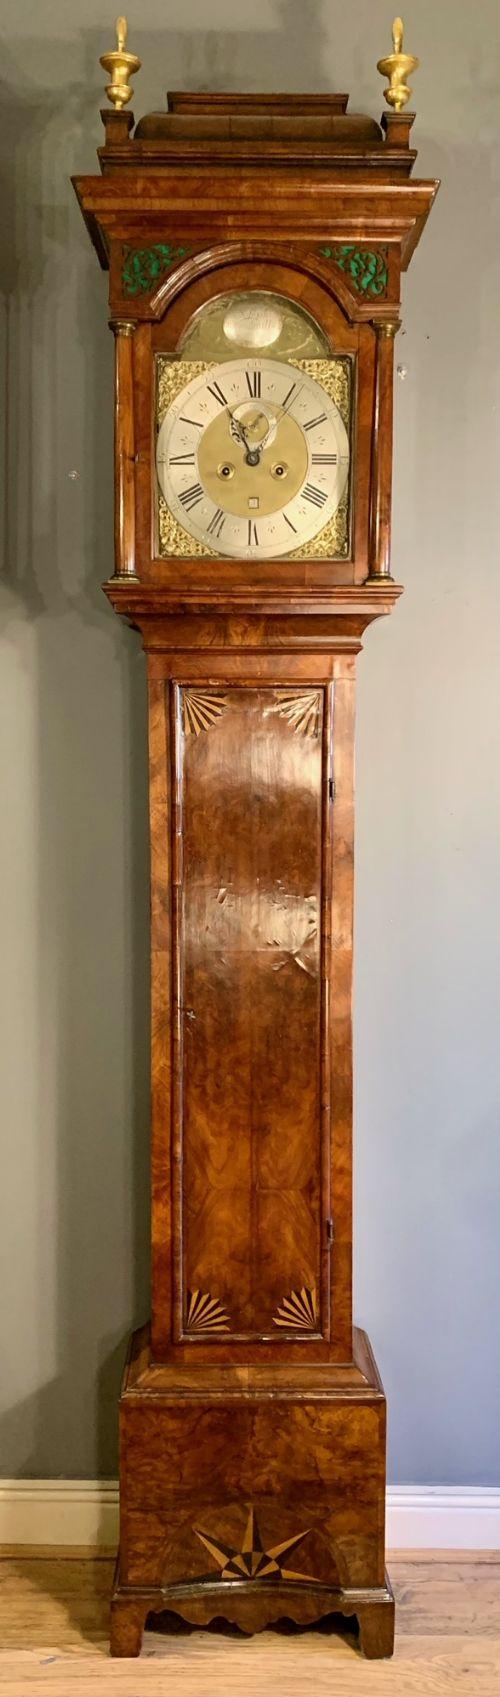 a stunning james ii burr walnut longcase clock by joseph windmills c1690